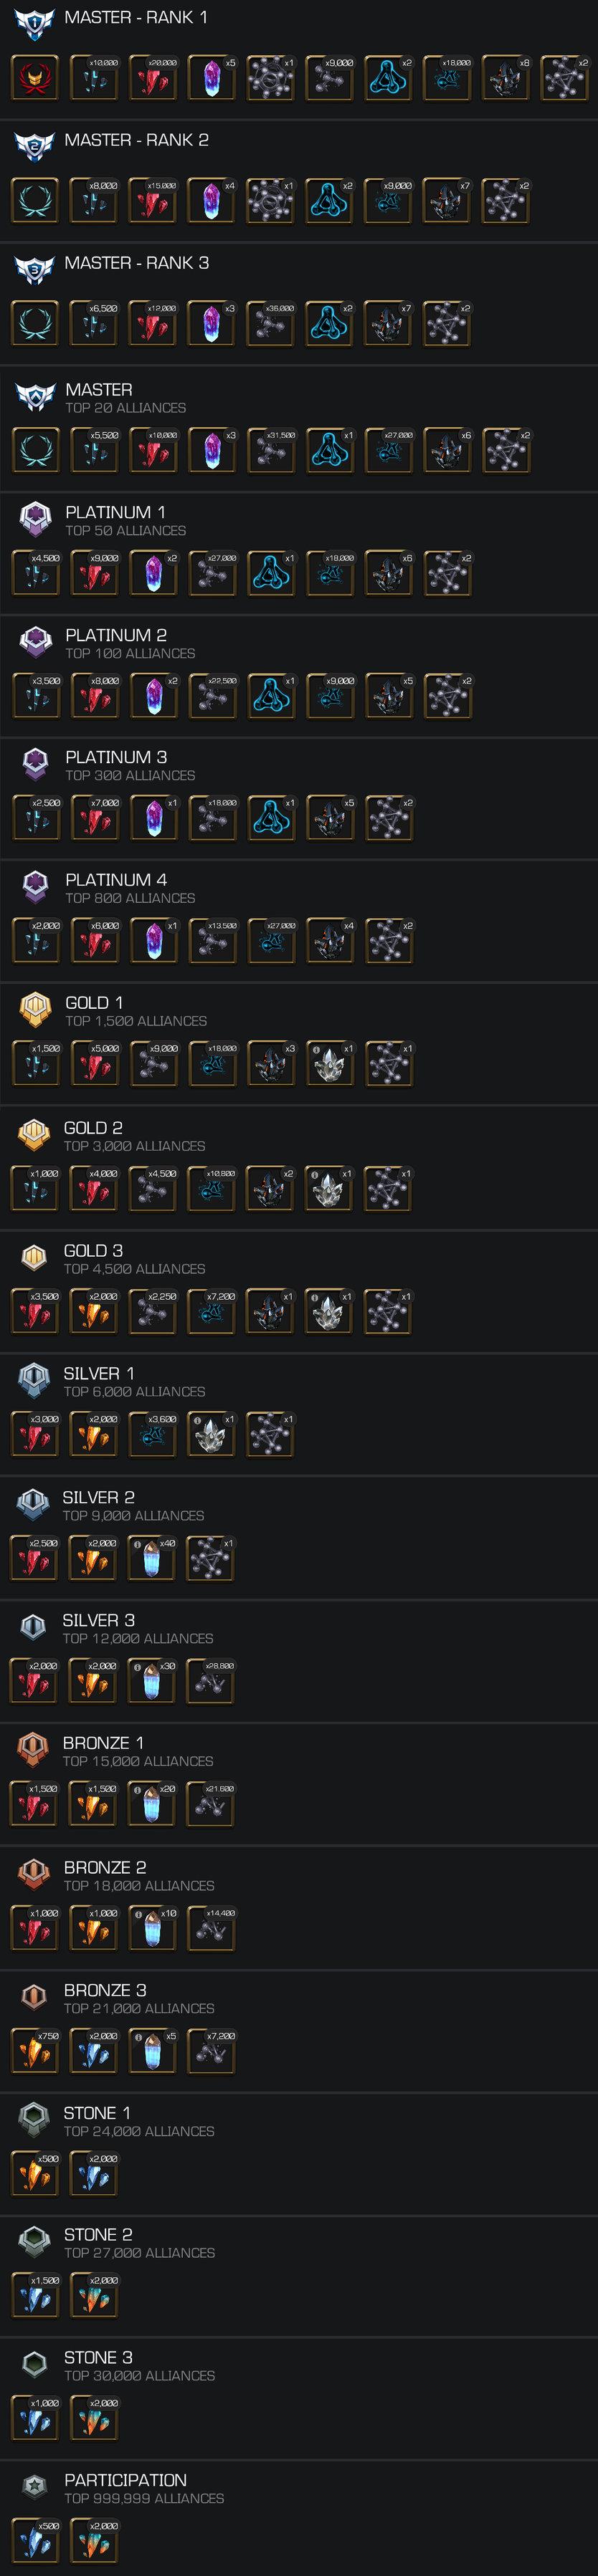 AW Season 11 Rewards and Ranking